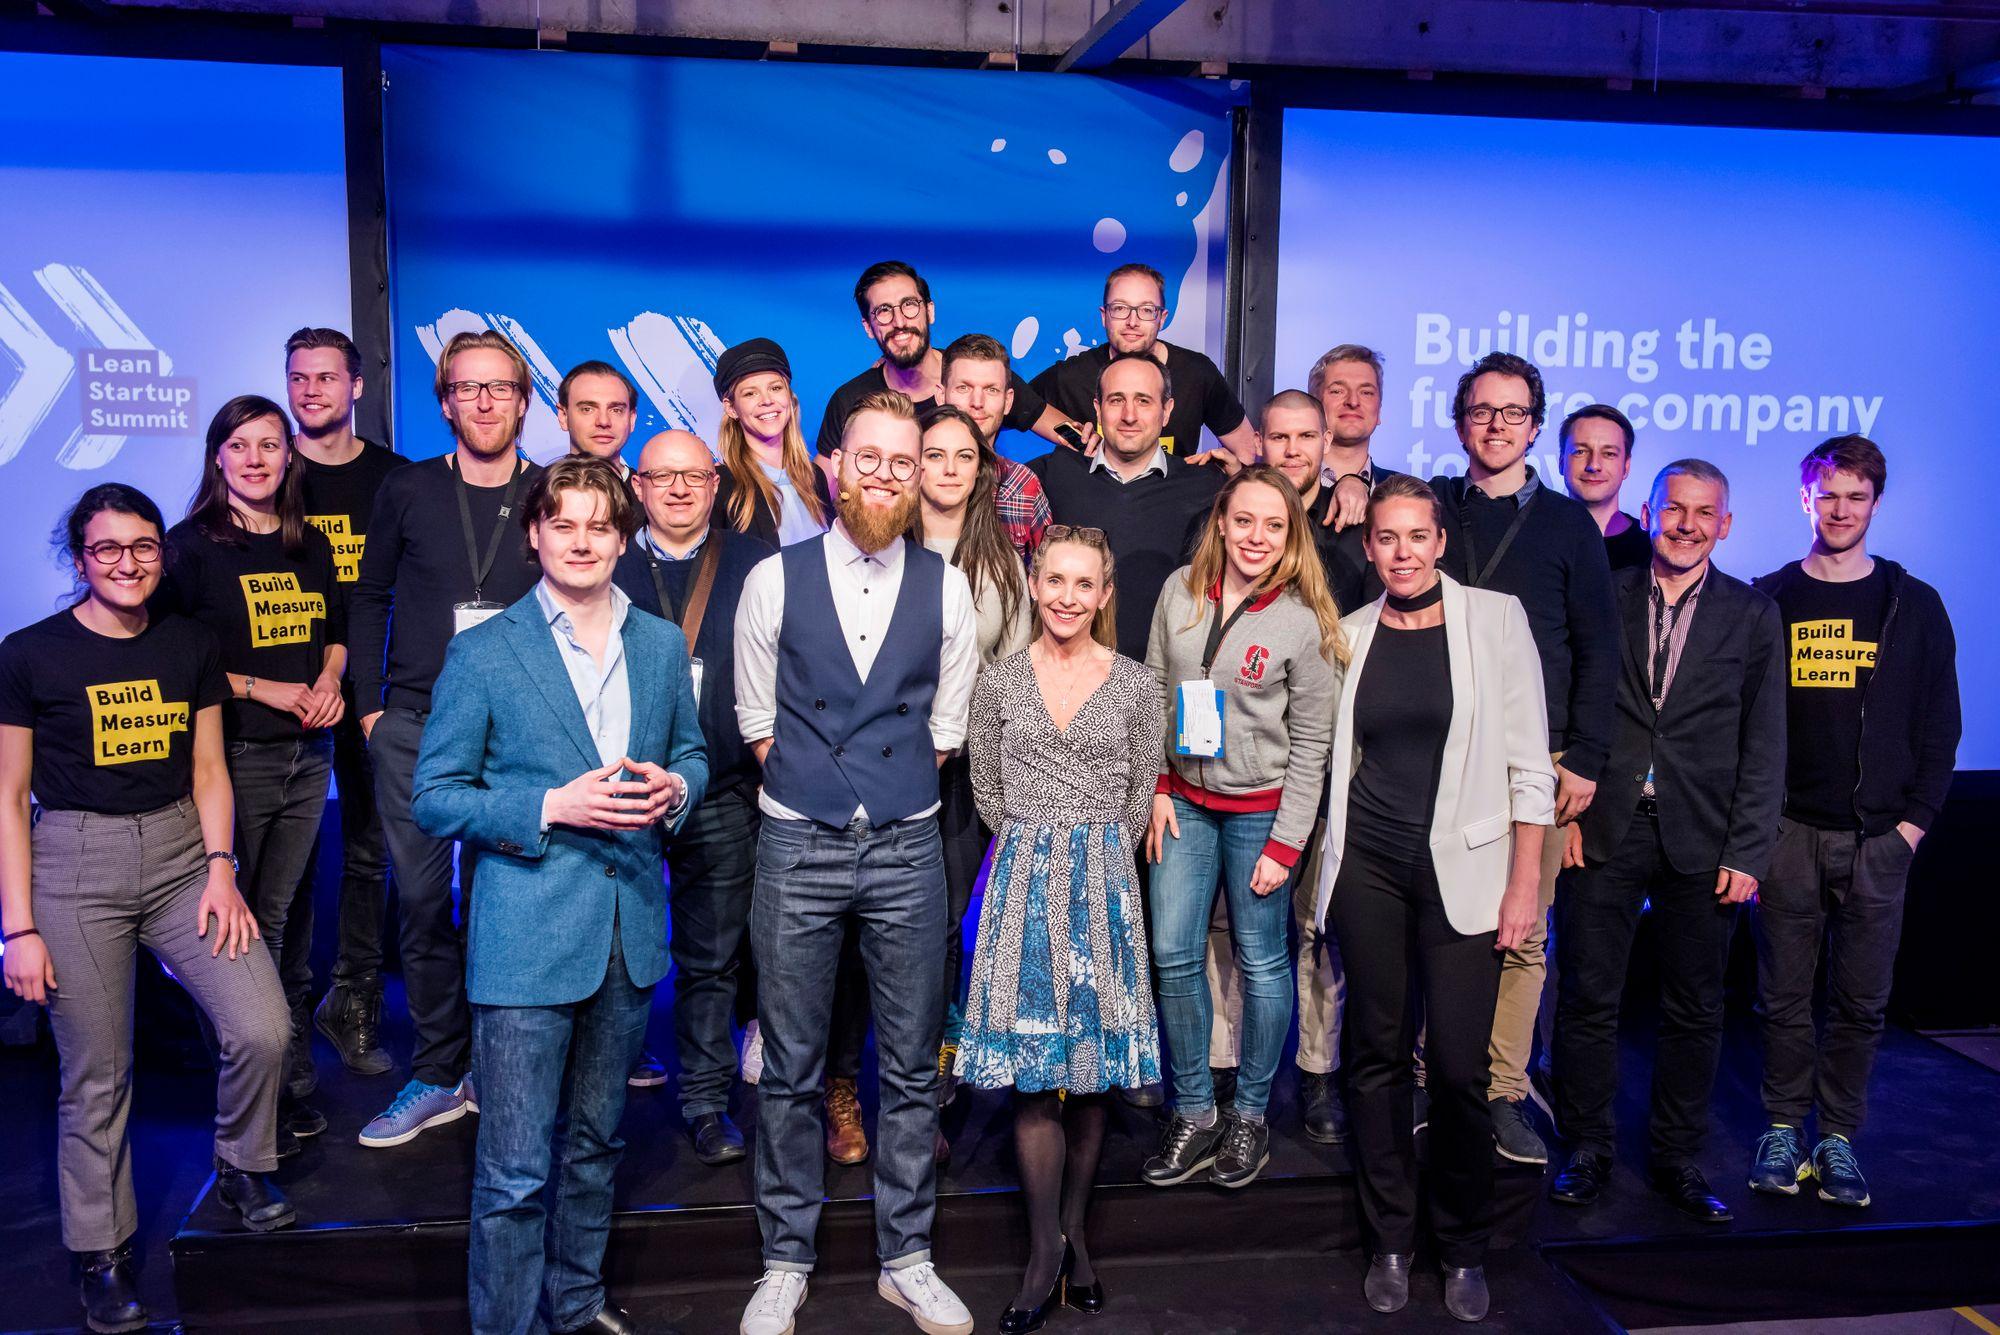 Lean Startup Summit Europe 2018 team